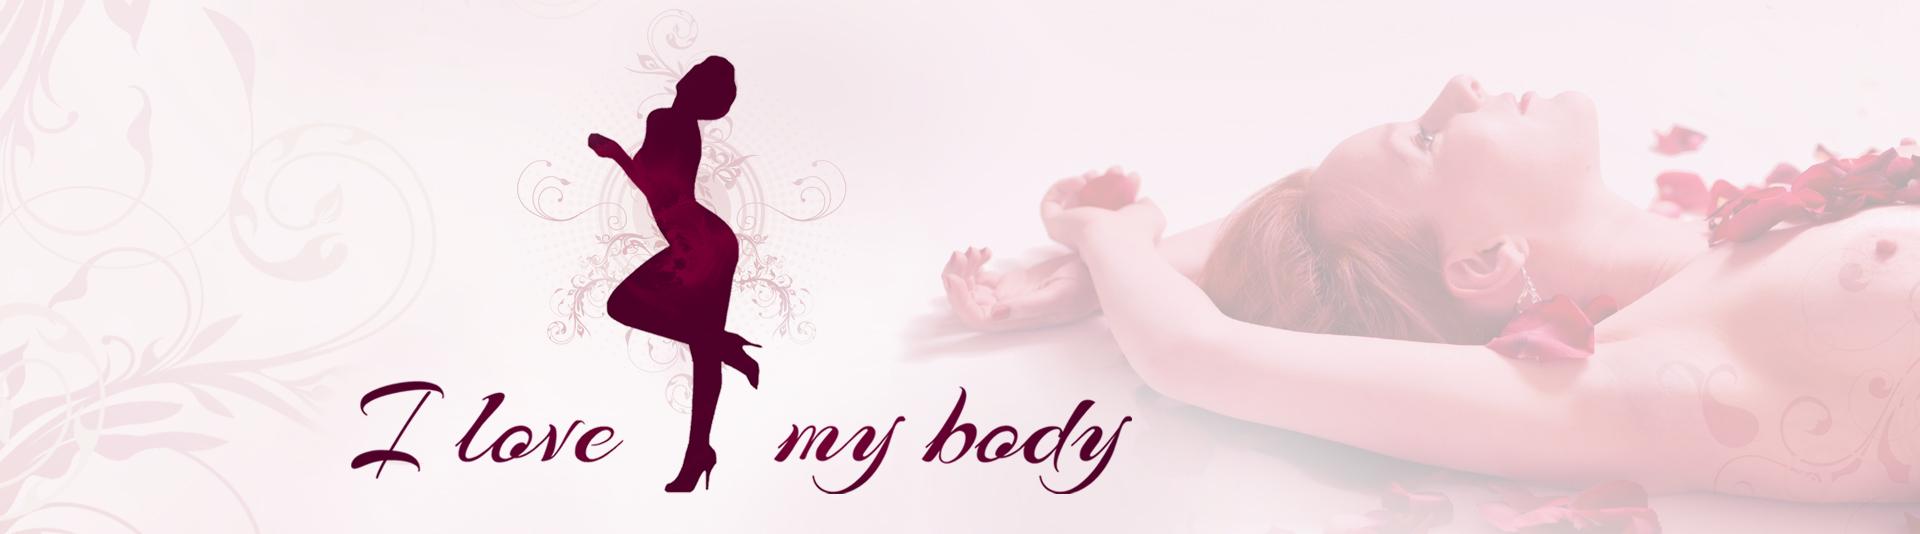 Judith Hartwig -Leben im Gleichgewicht -I love my body